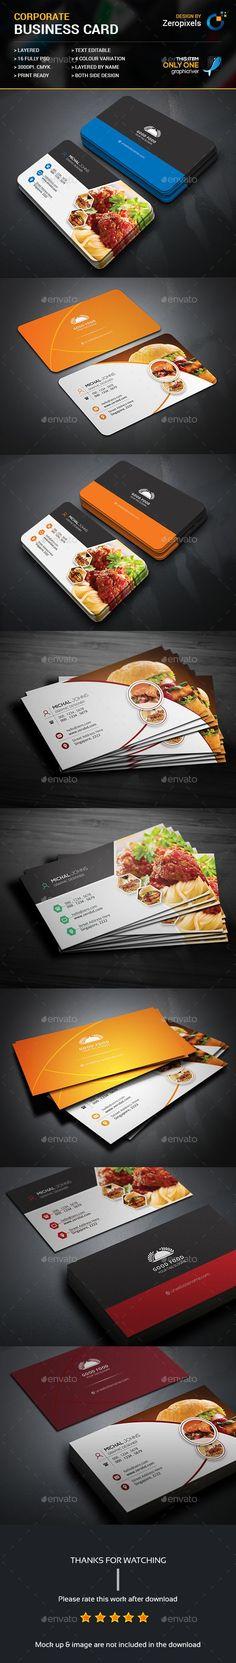 Restaurant Business Card Templates PSD Bundle More